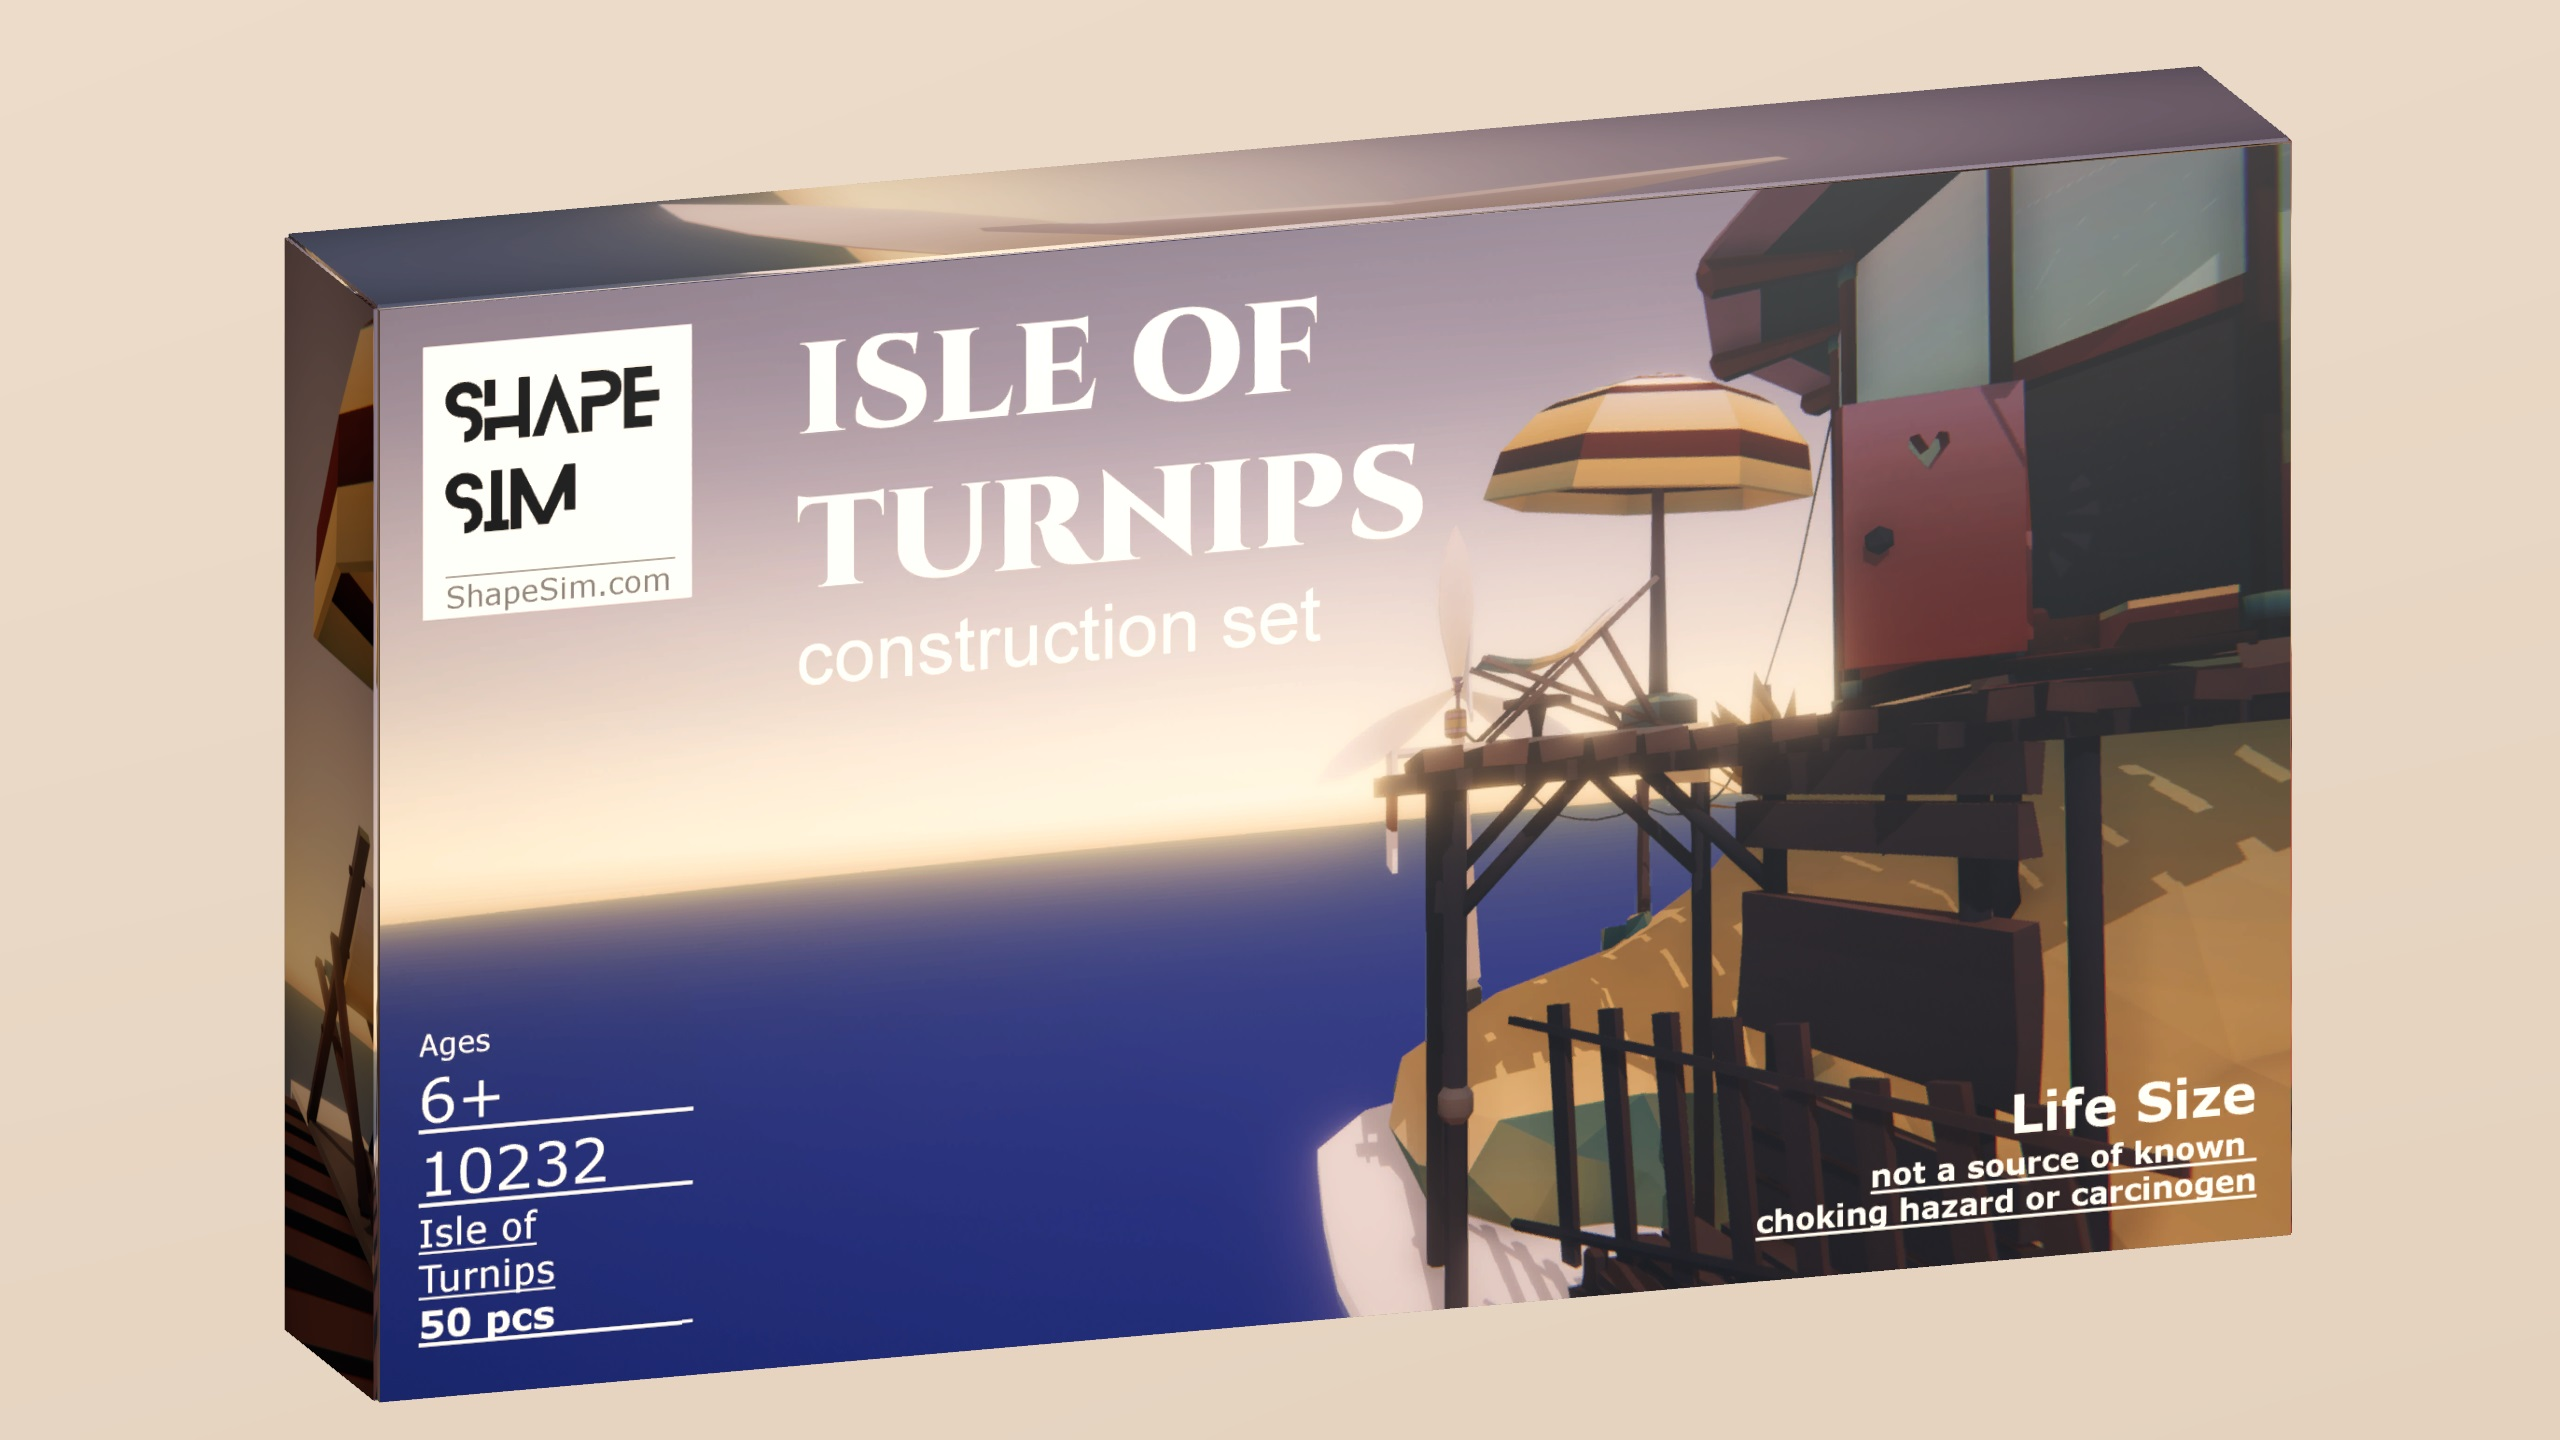 Isle of Turnips